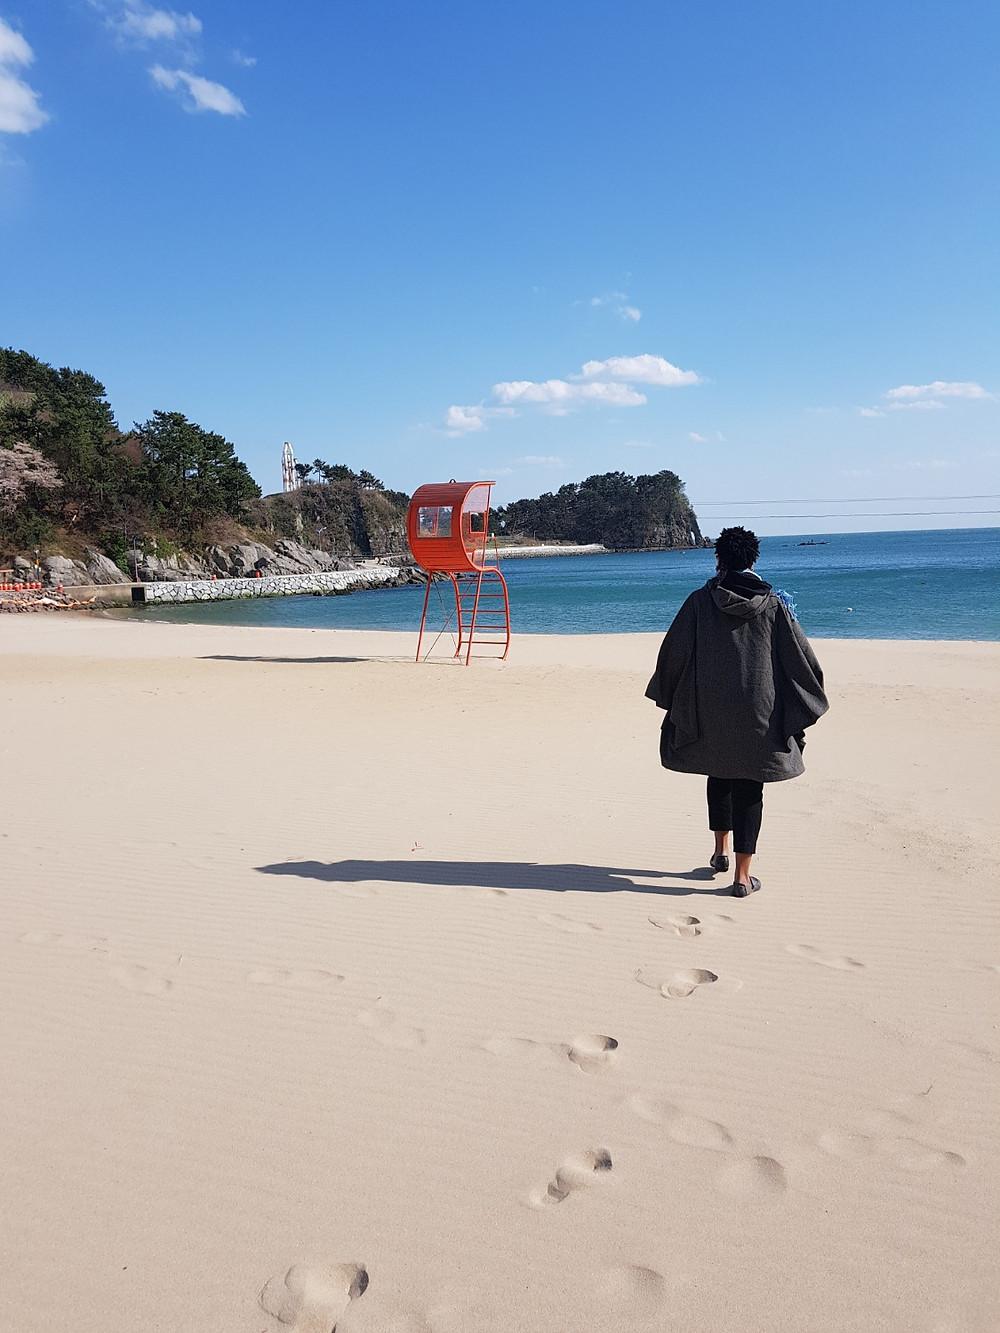 KC at Namildae Beach, South Korea